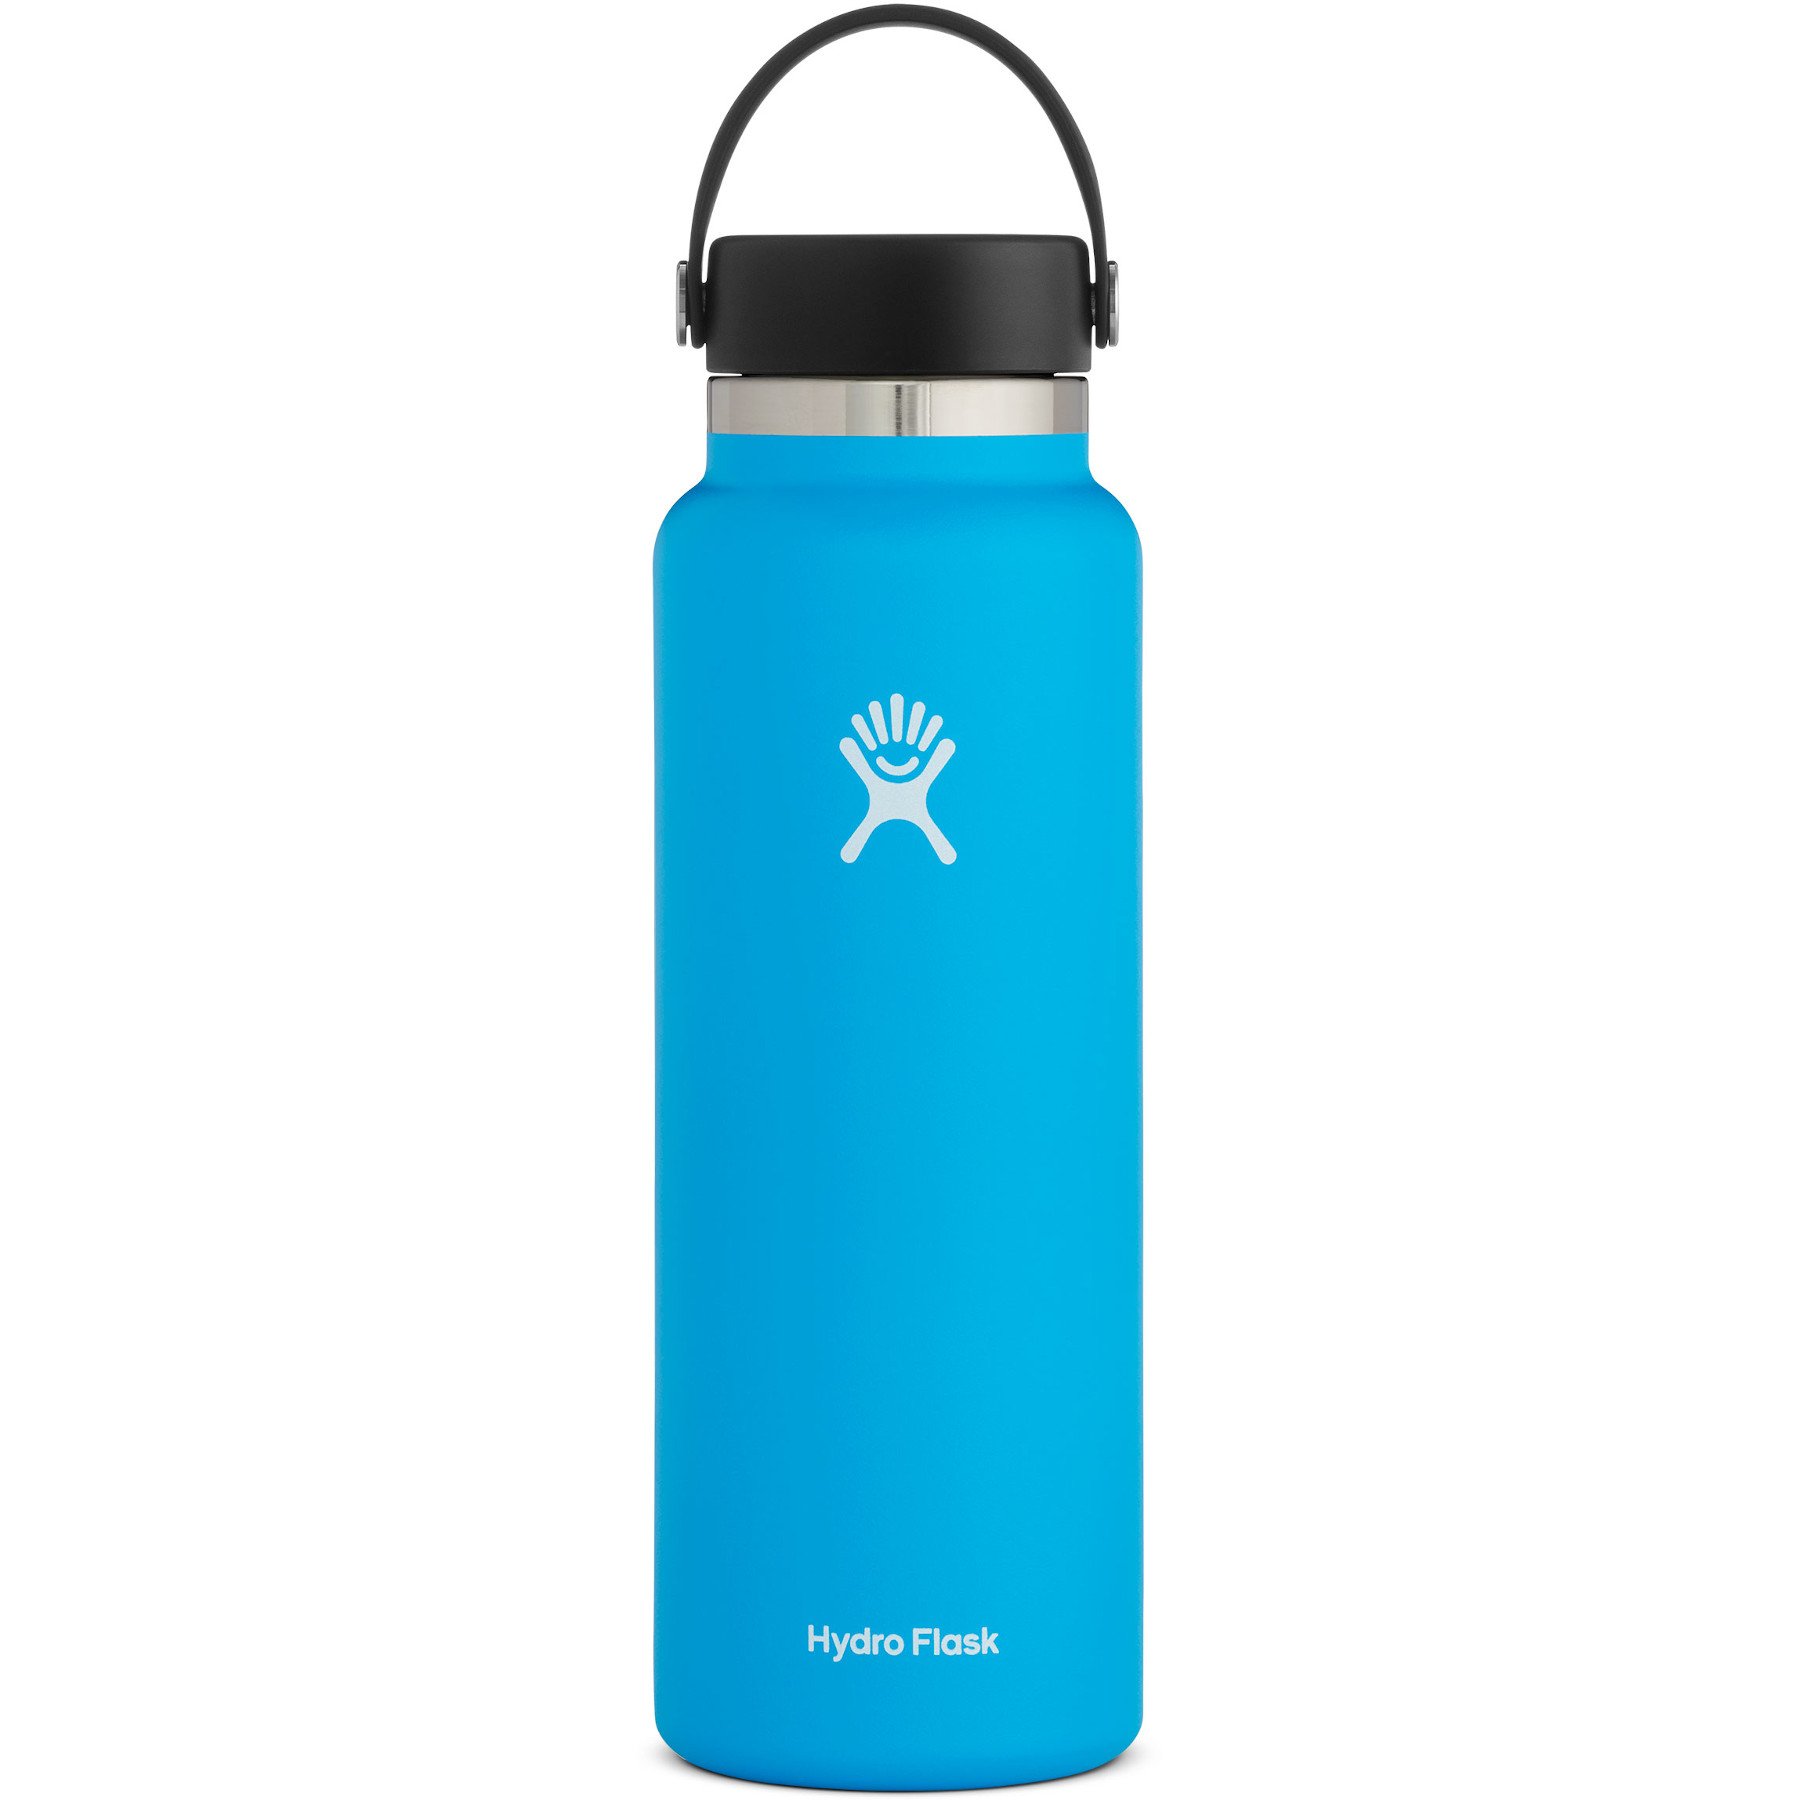 Hydro Flask 40 oz Wide Mouth mit Flex Cap 2.0 Thermoflasche 1182 ml - Pacific